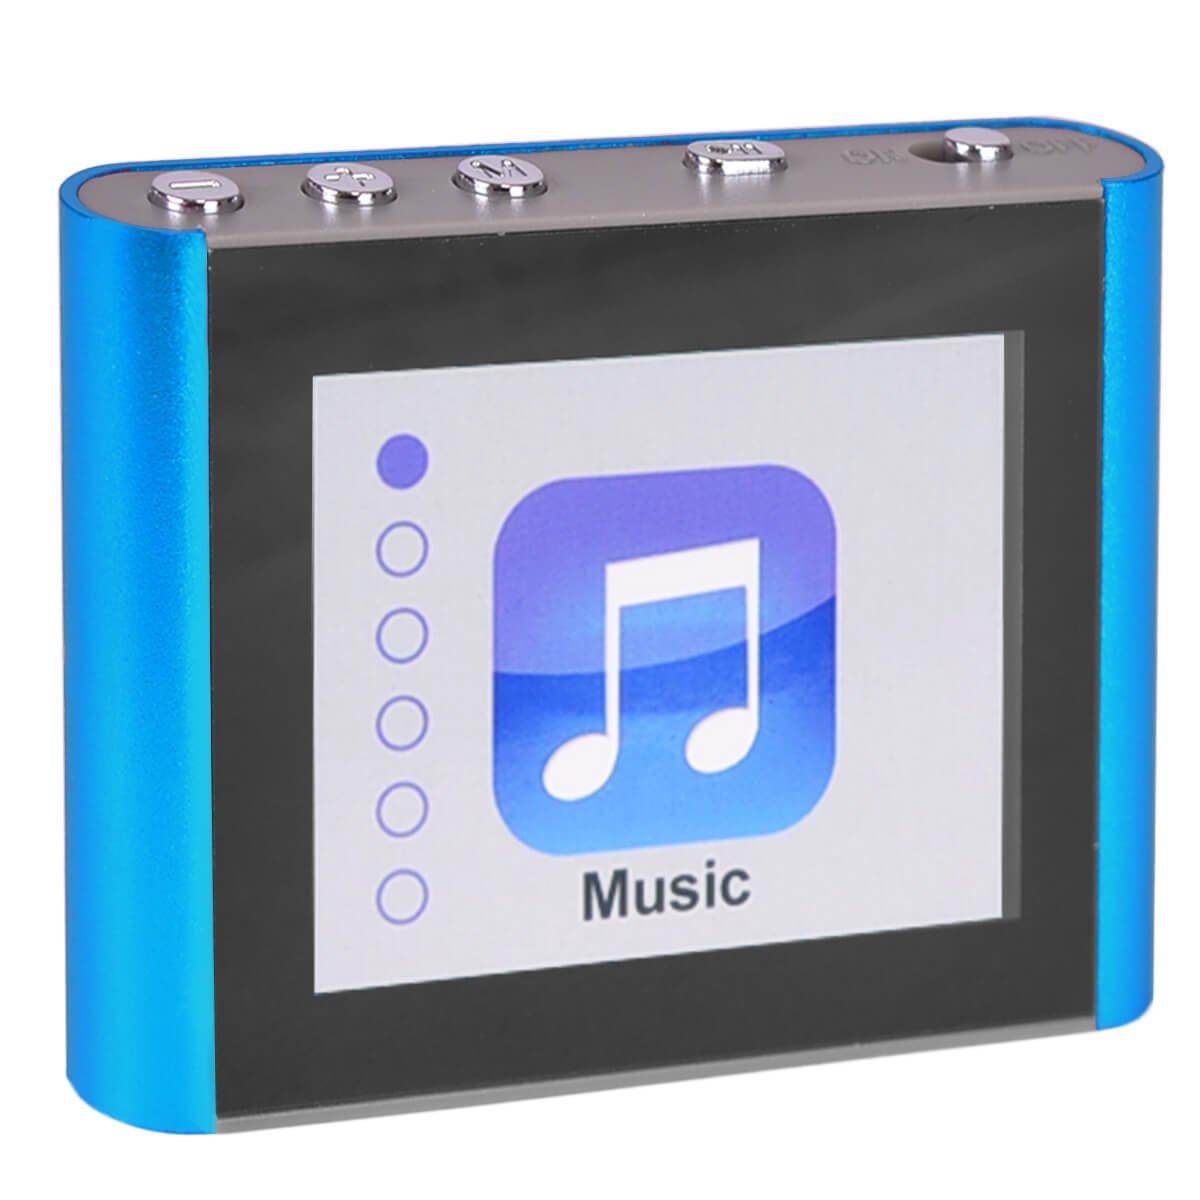 ECLIPSE Eclipse Fit Clip Plus BL 8GB 1.8 MP3 + Video Player (Blue)